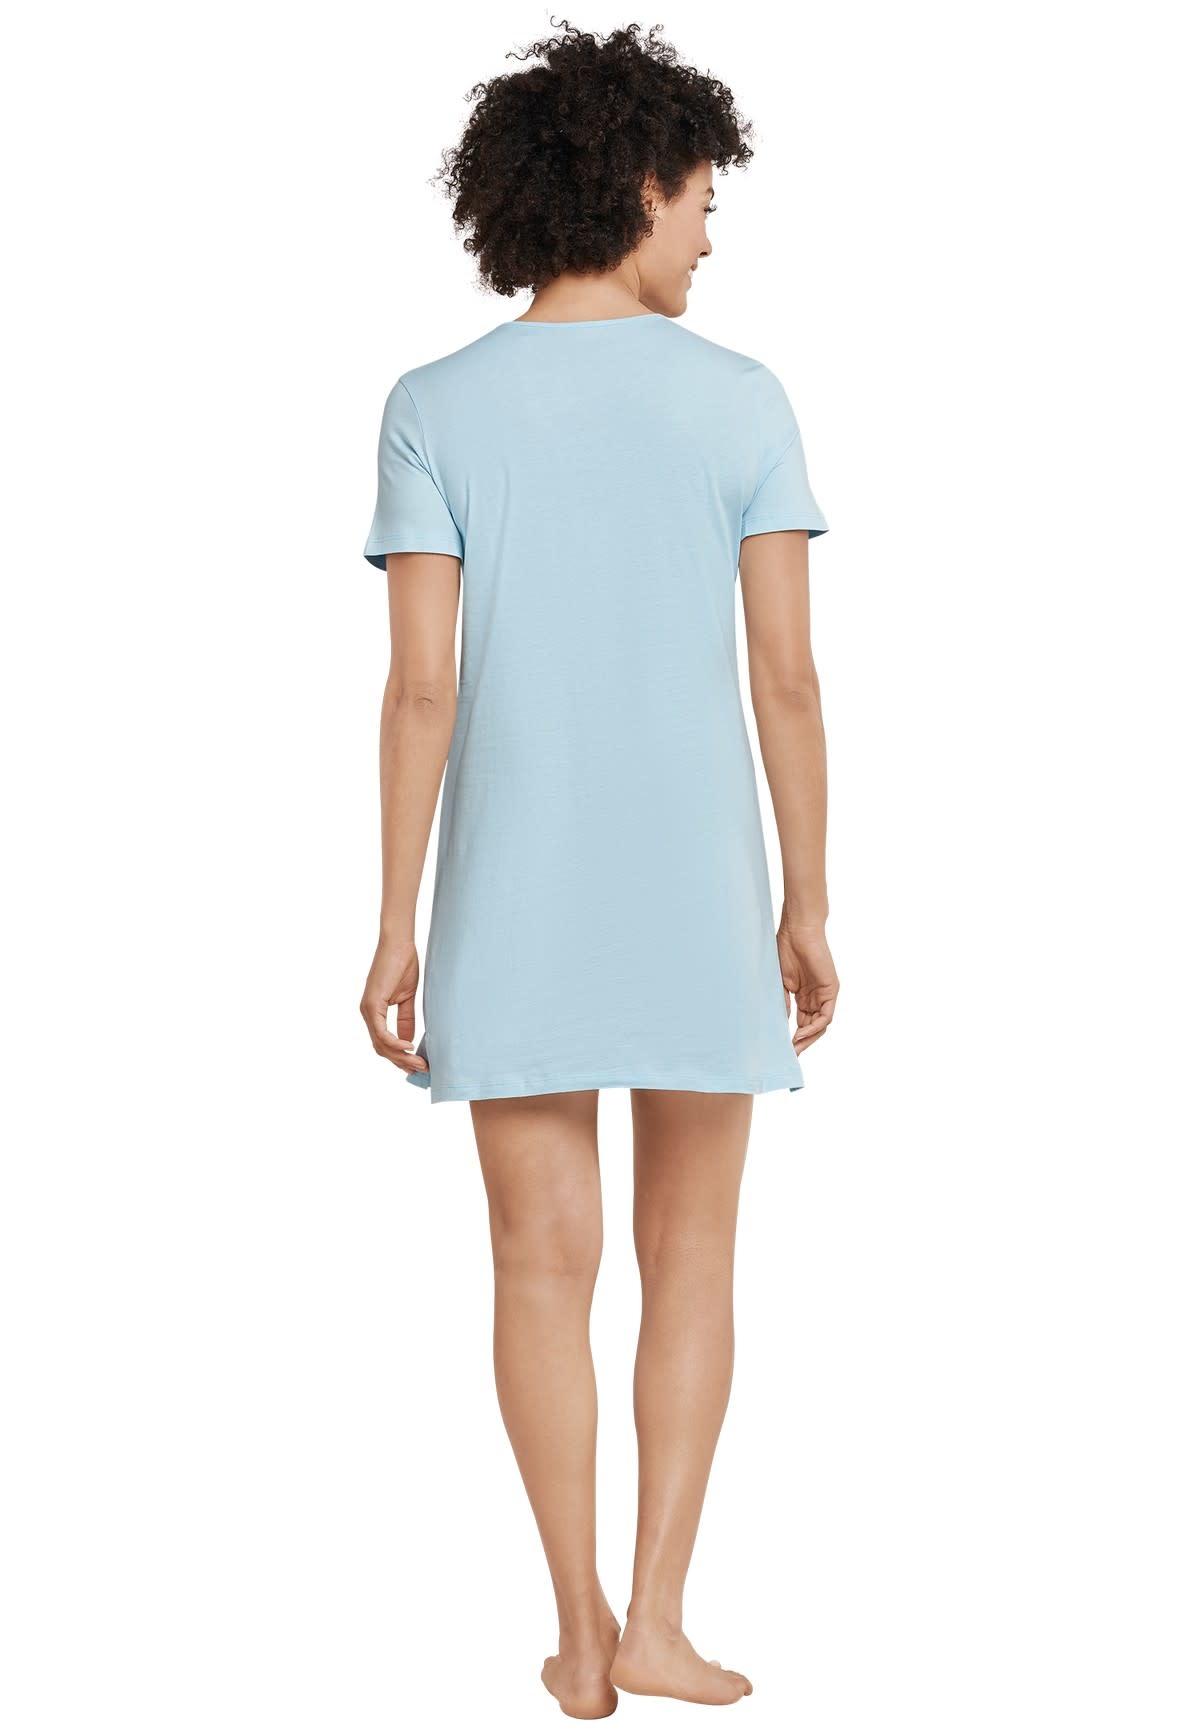 Nachthemd korte mouw 169488 - lichtblauw-2